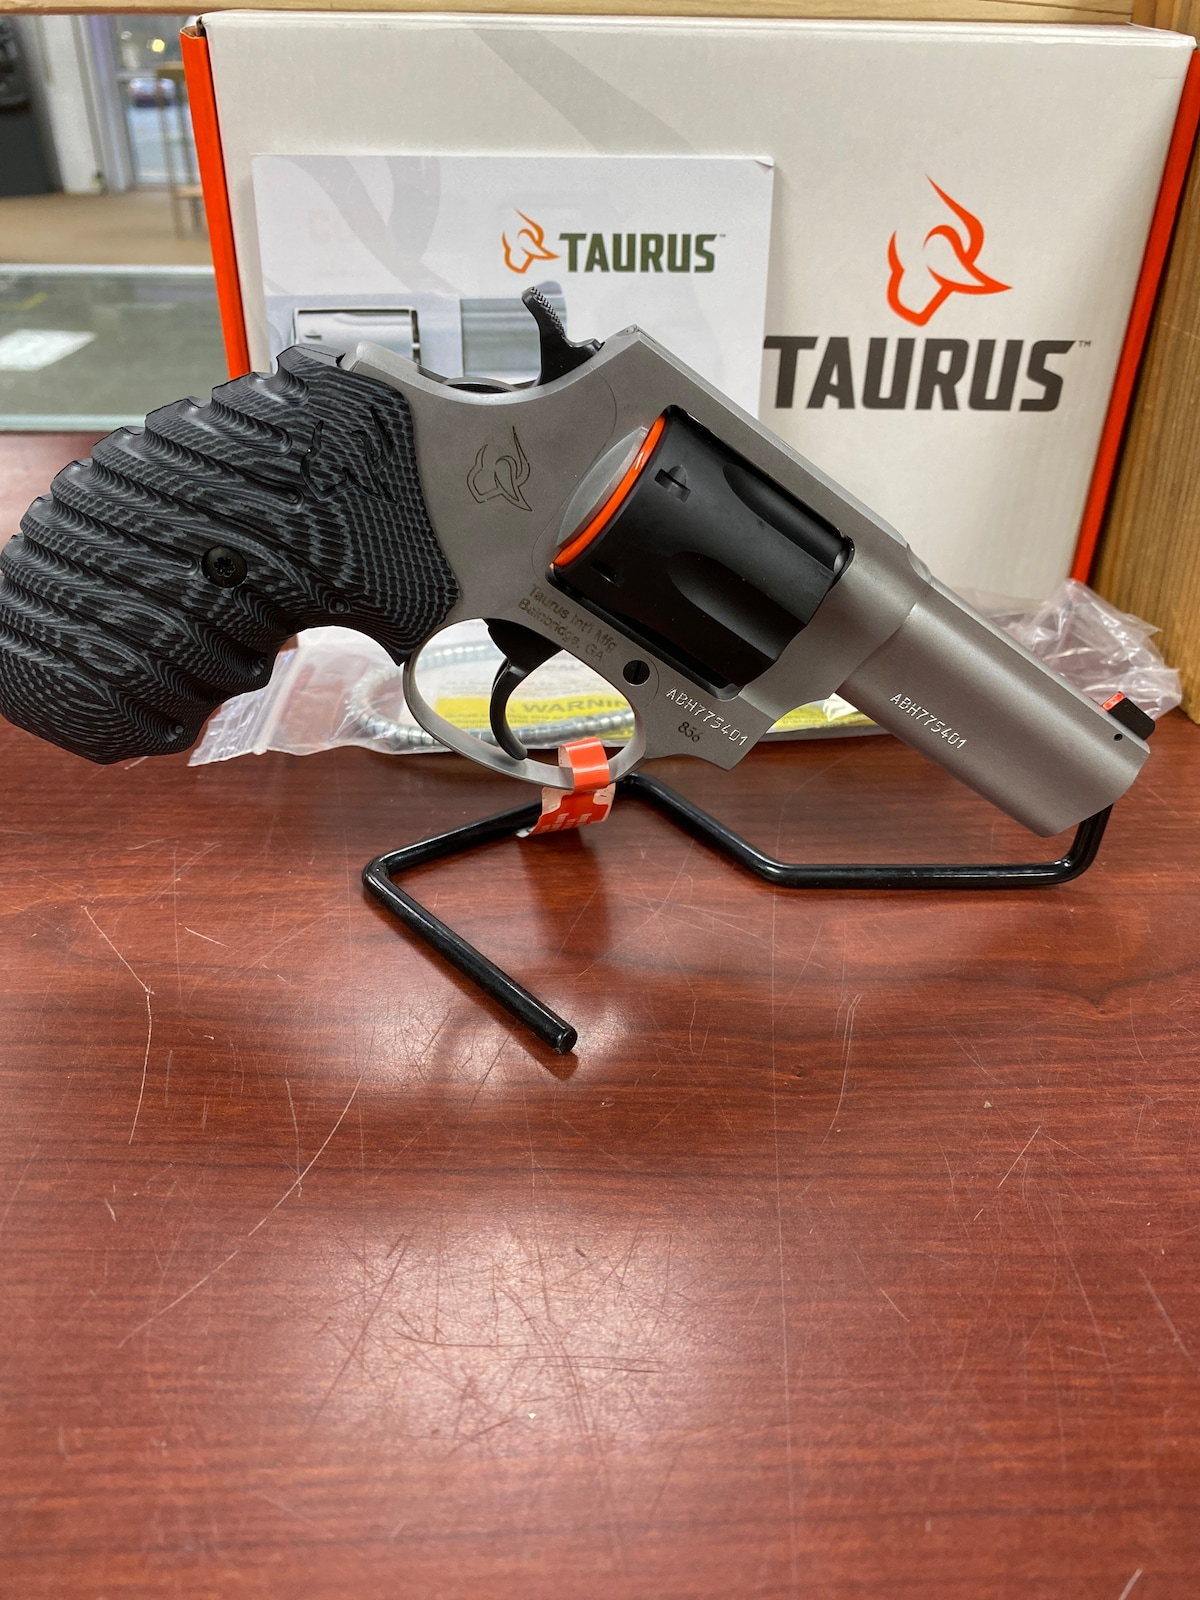 TAURUS 856 2-85635nsvz  night sight vz grip